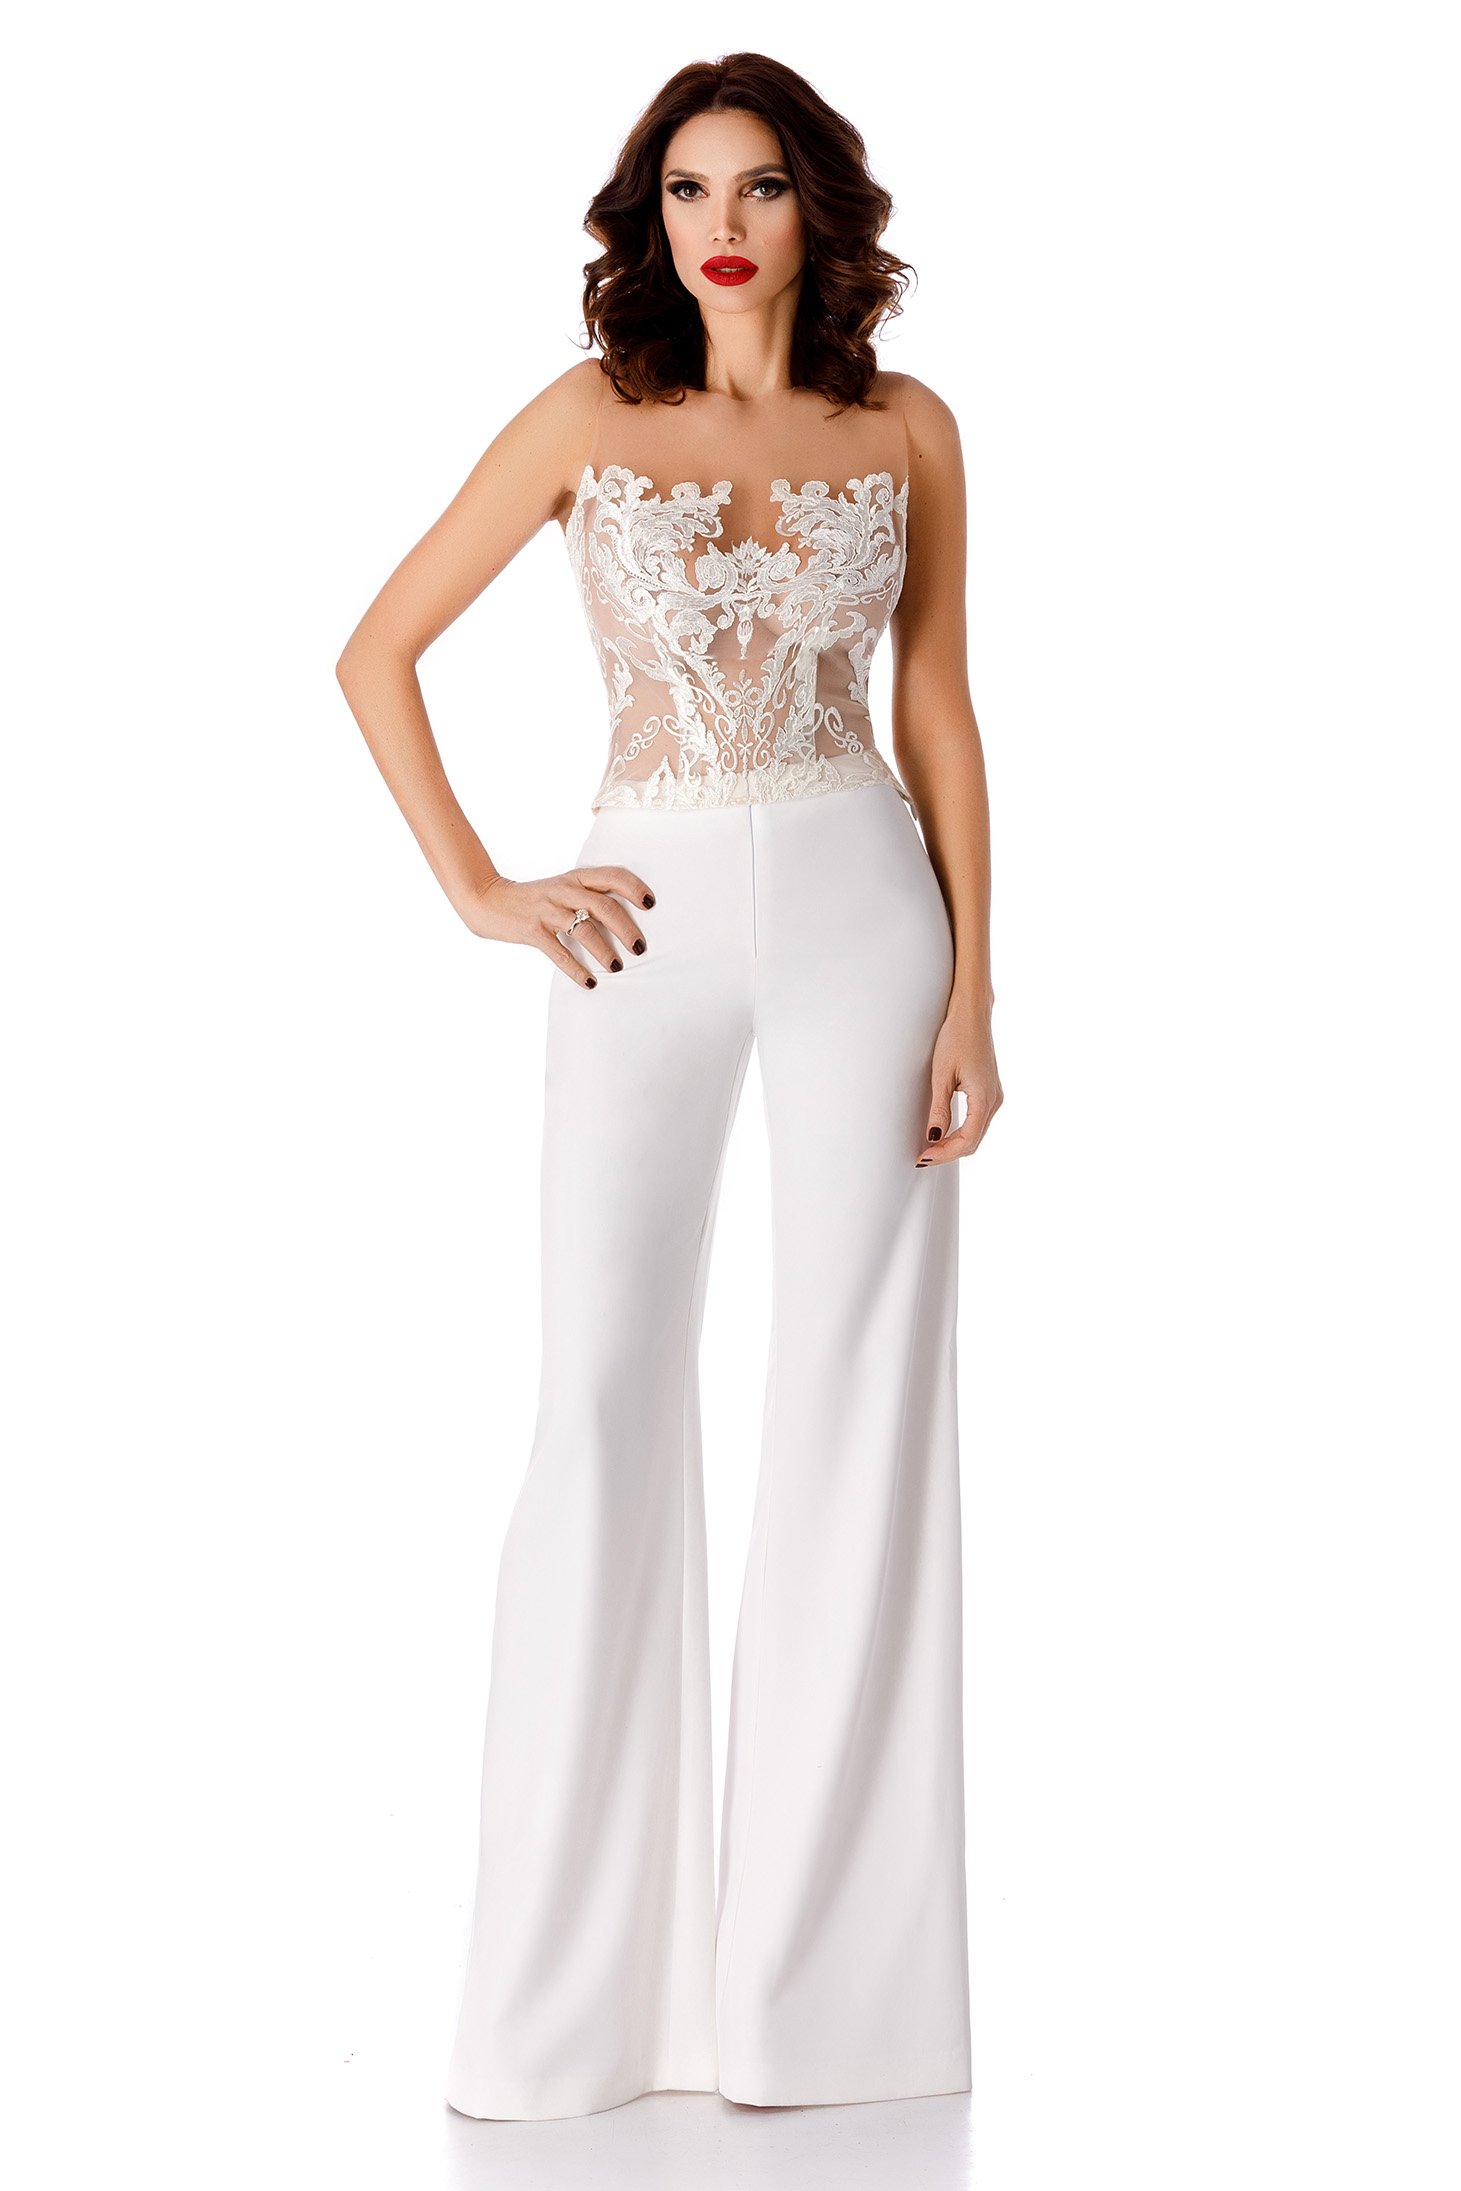 Pantaloni albi eleganti cu talie inalta evazati din stofa subtire usor elastica